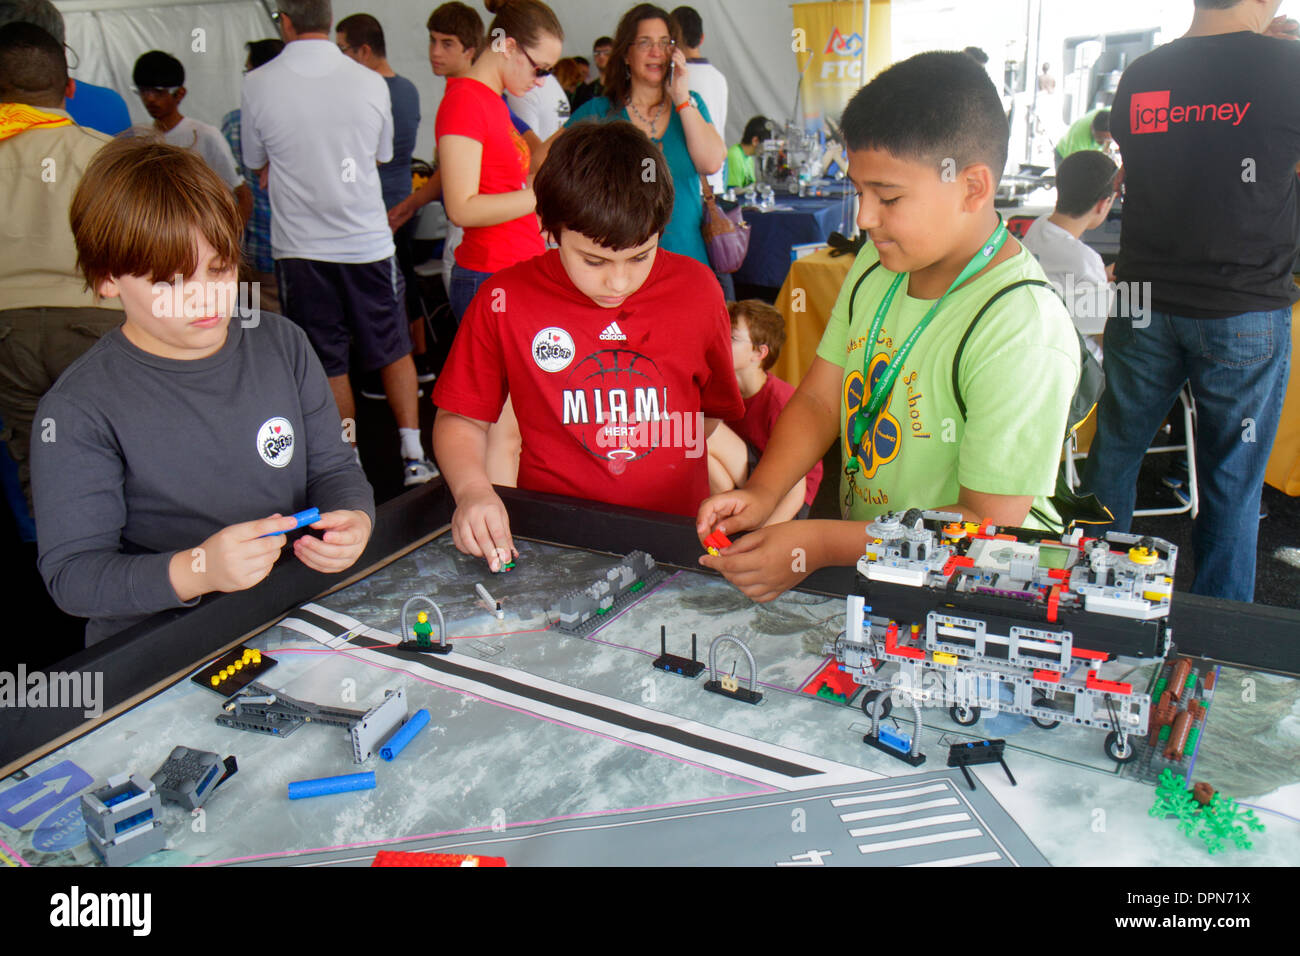 Miami Homestead Florida Speedway DARPA Robotics Challenge Trials robot robots exhibits student boy Hispanic Lego Stock Photo